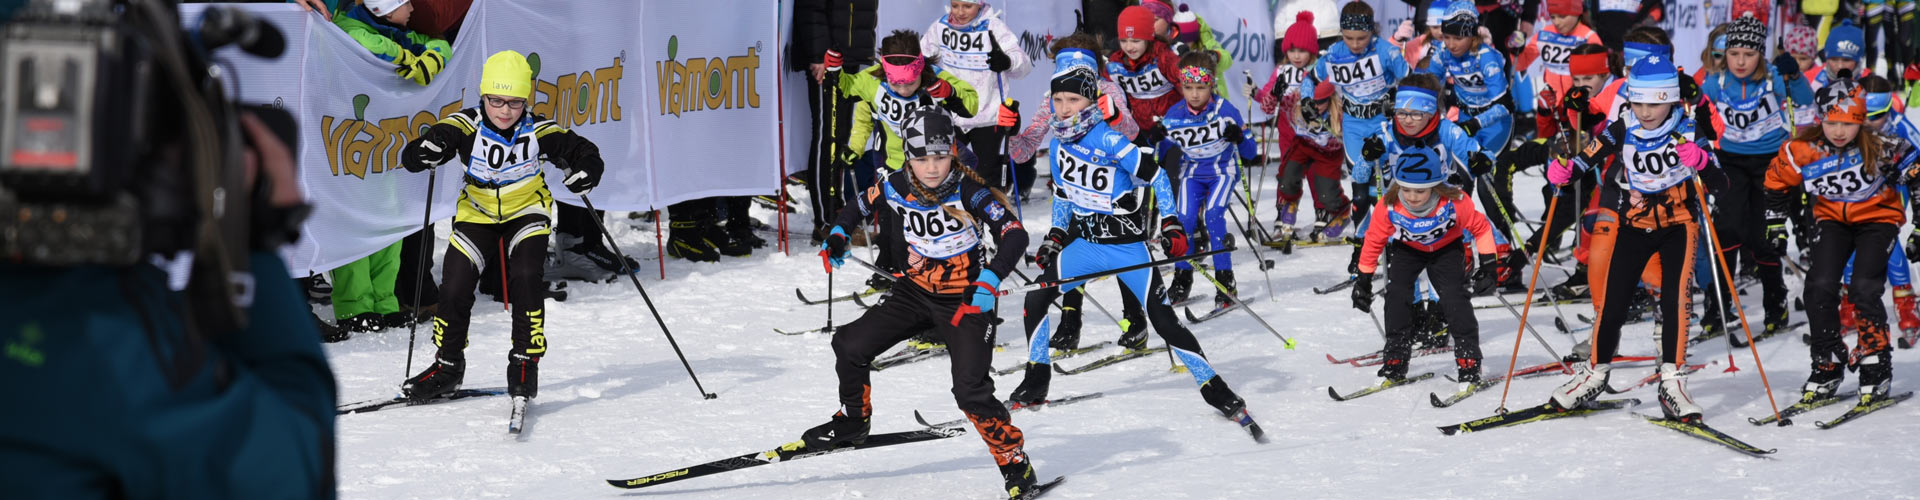 Ski klub Strakonice